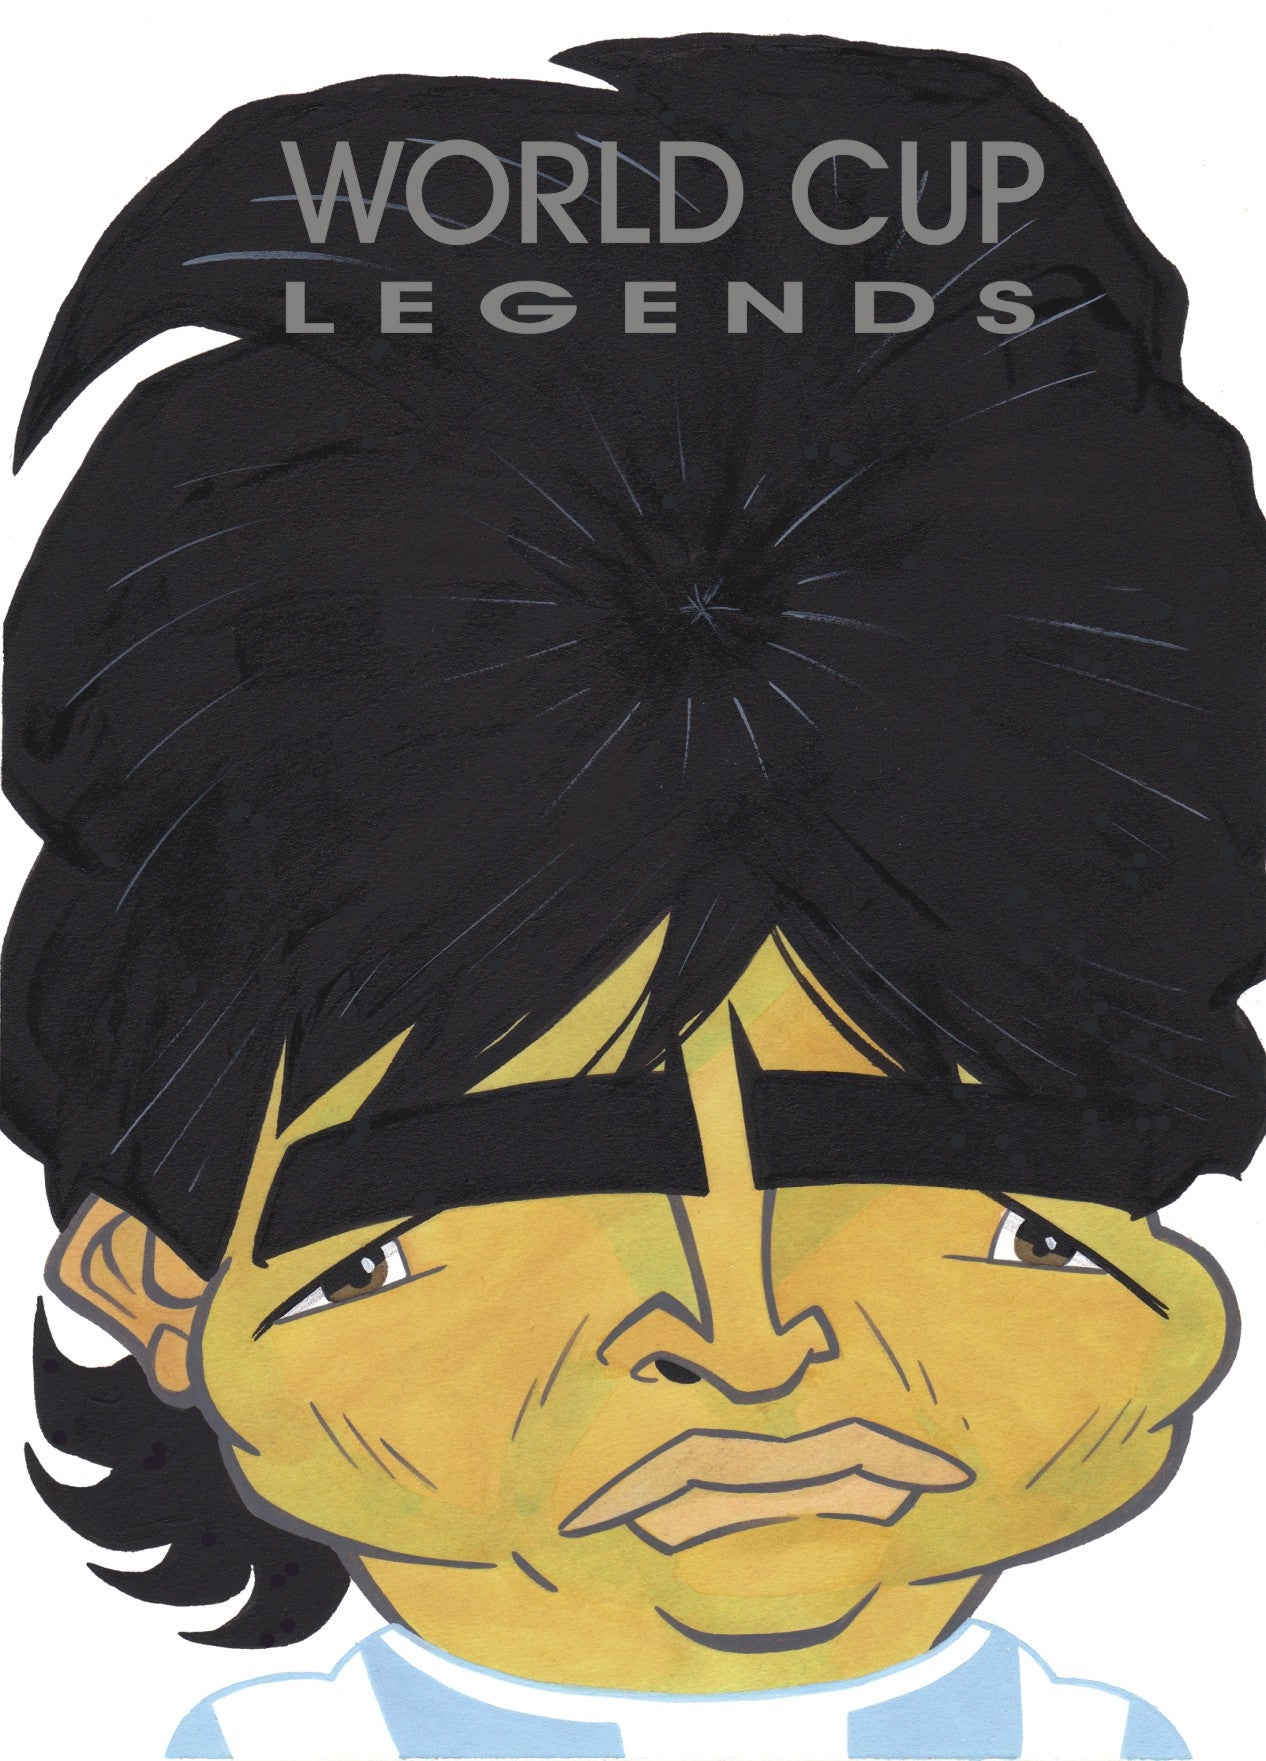 Image of World Cup Legends (Diabetes UK)